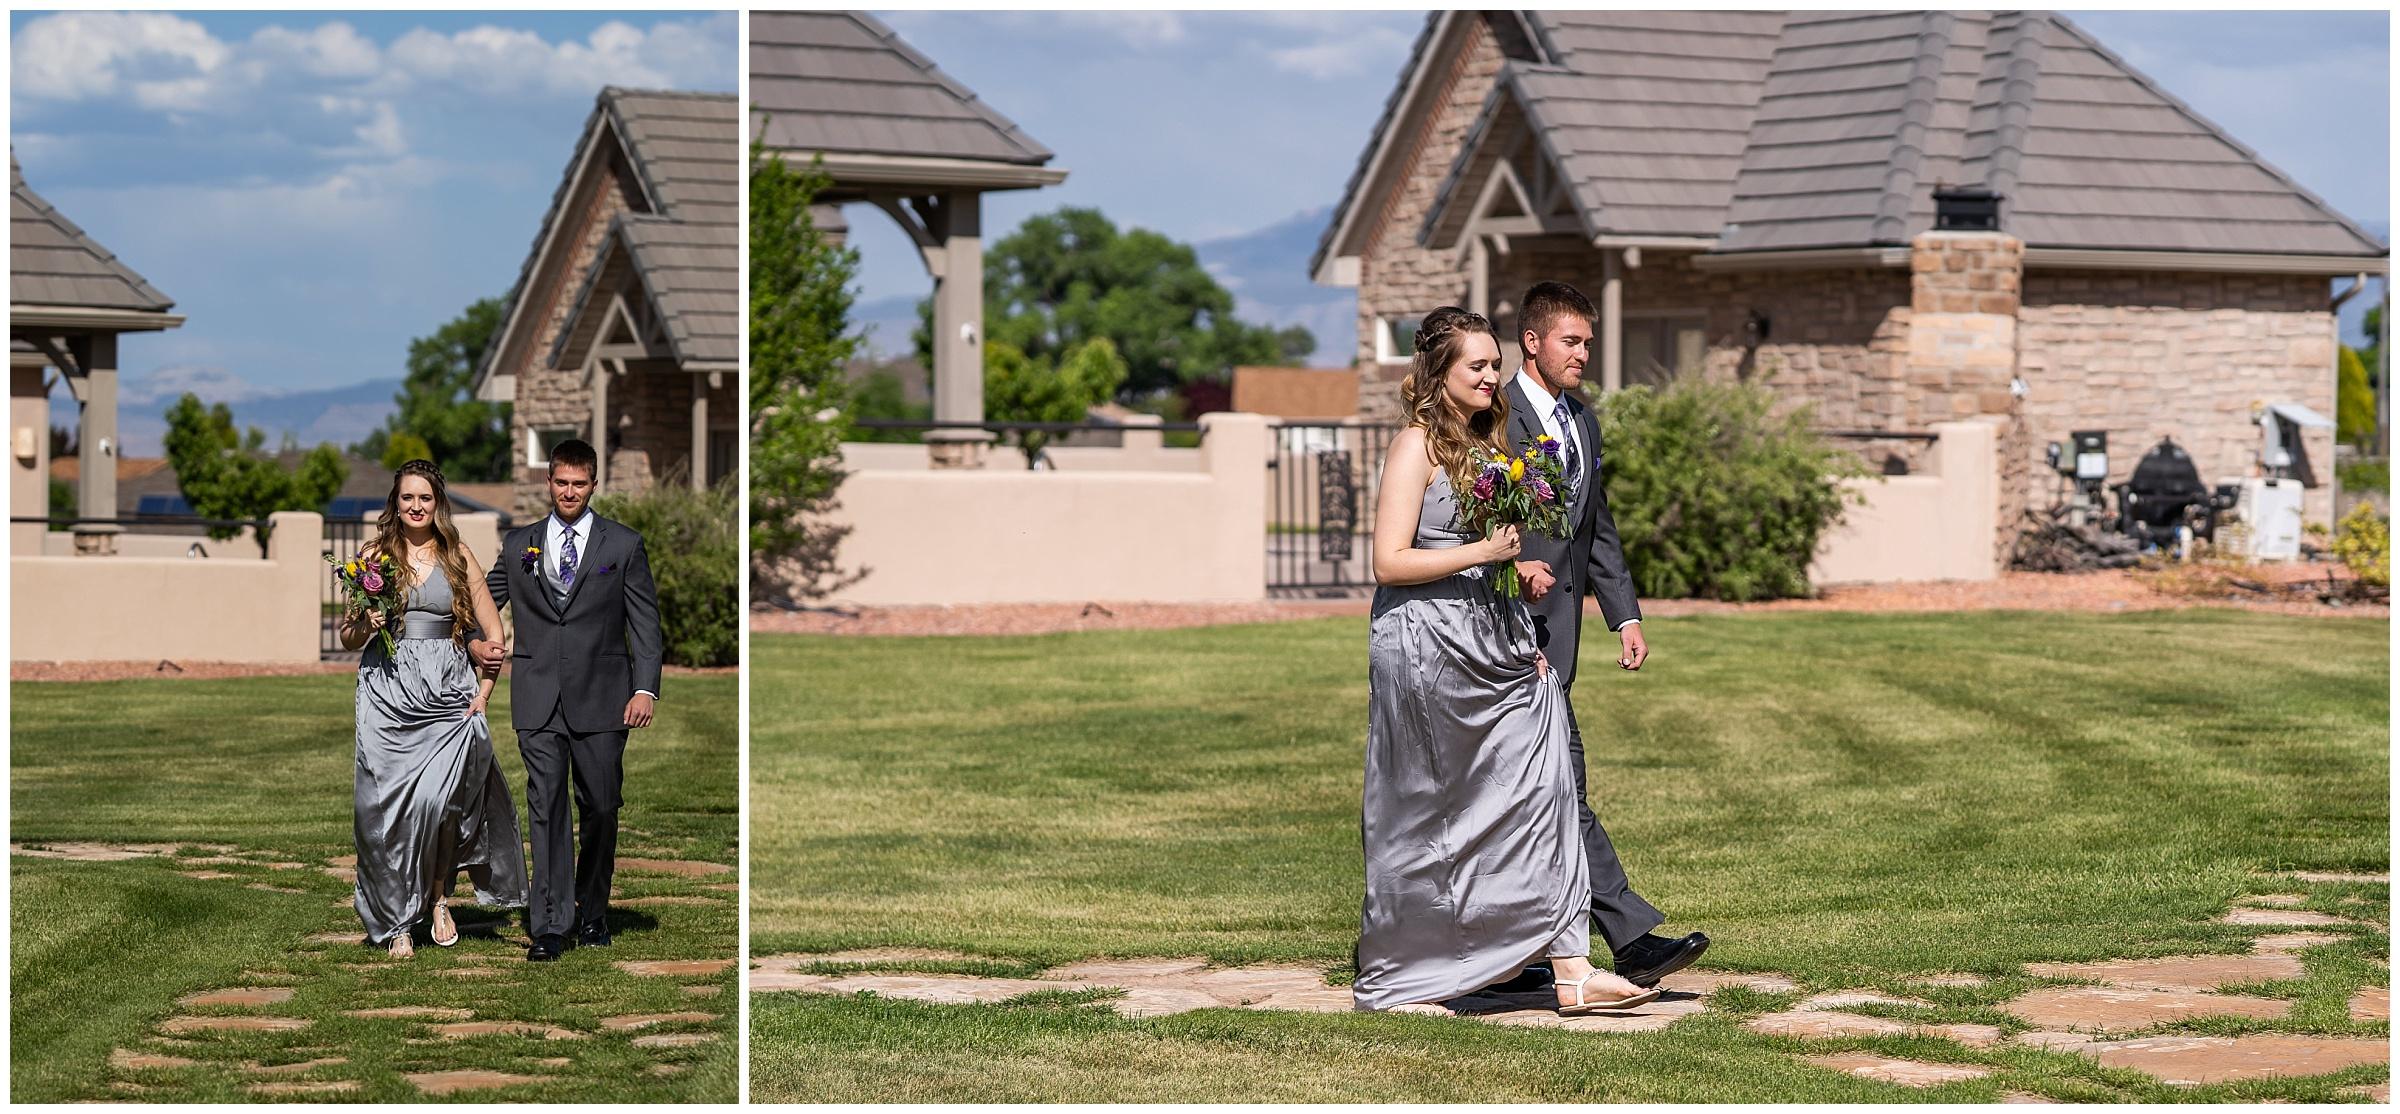 Grand Junction Wedding Photographer 0036.jpg